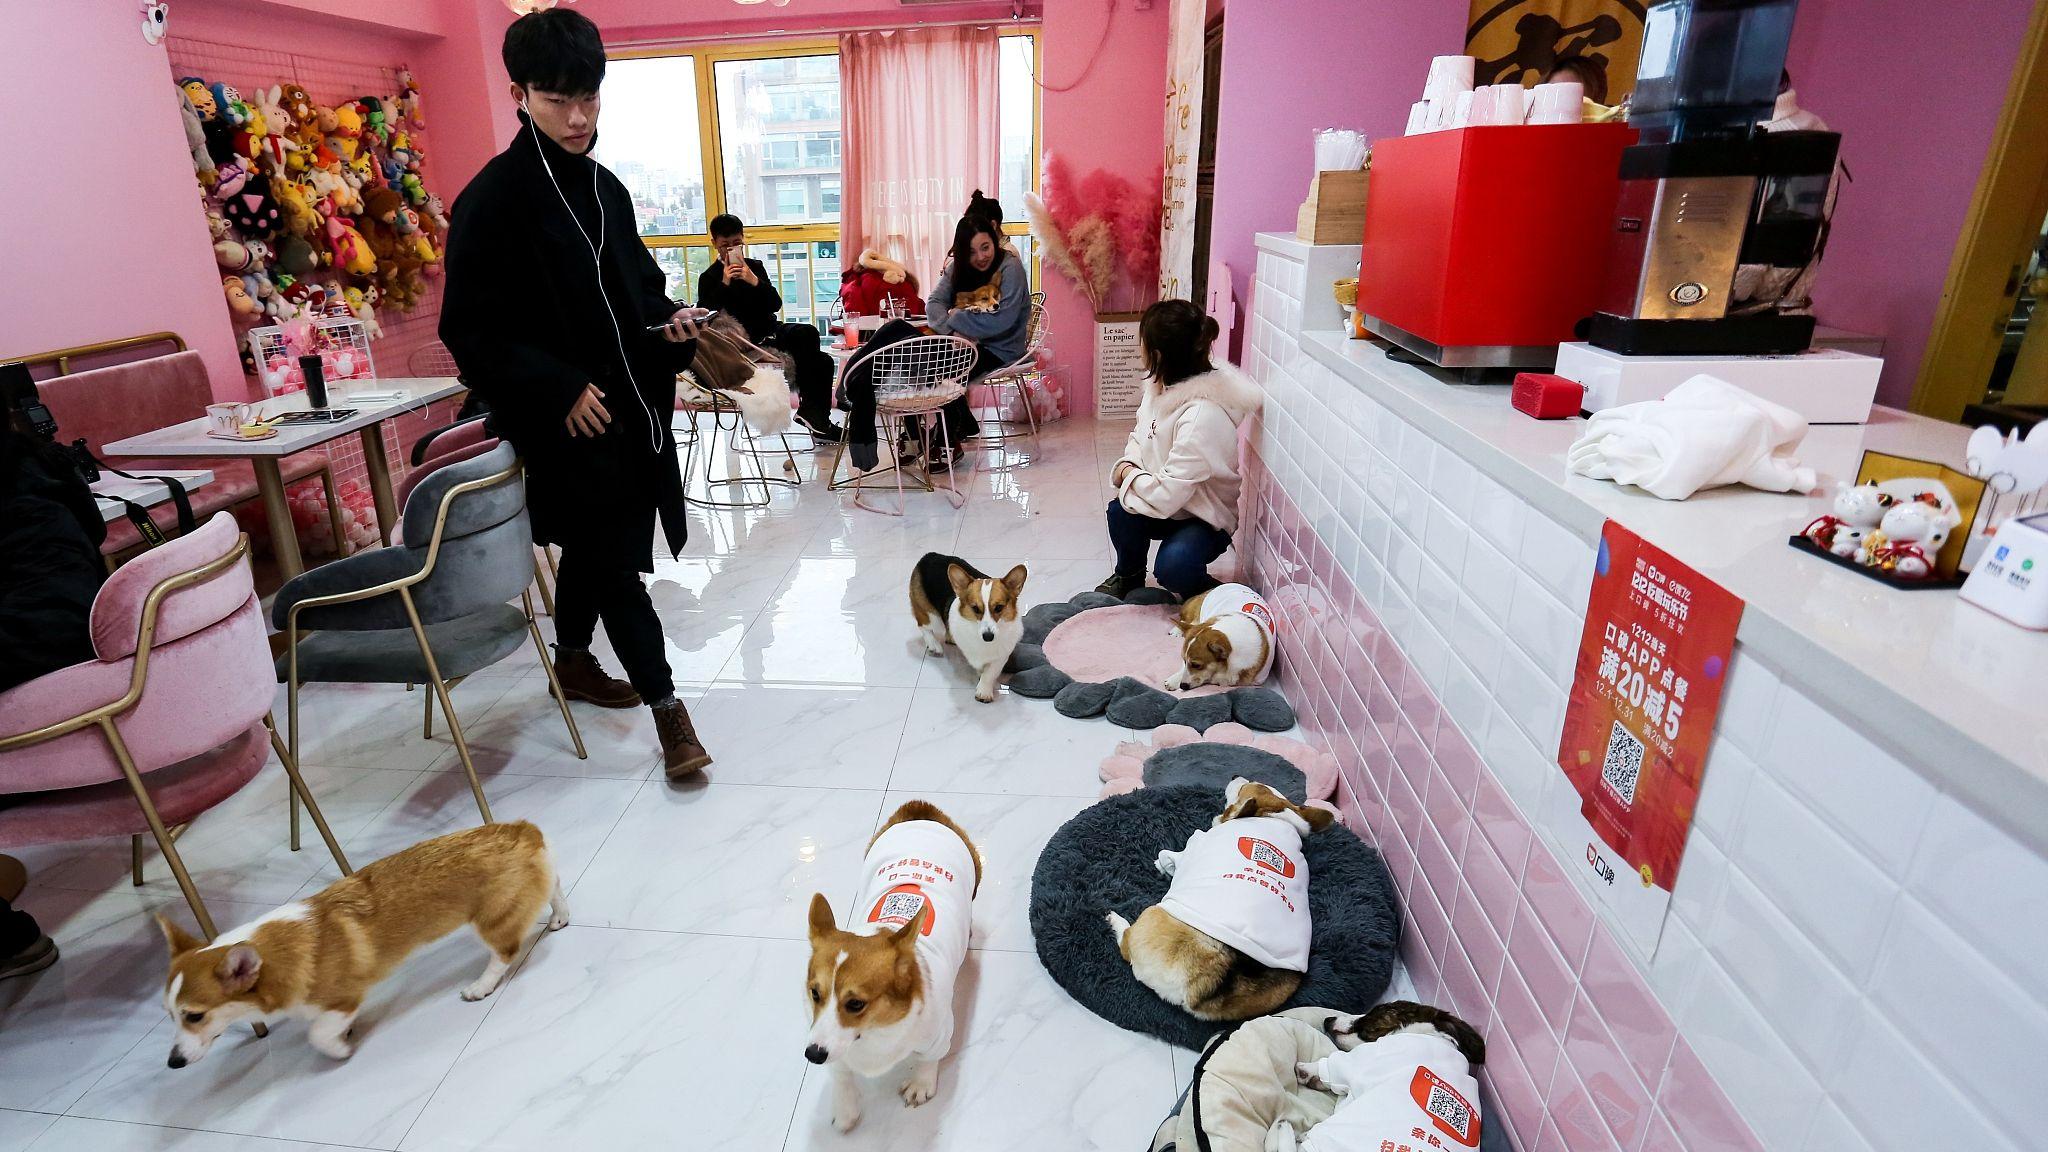 Corgis wait tables at Shanghai cafe | Pet cafe, Dog cafe, Pet hotel